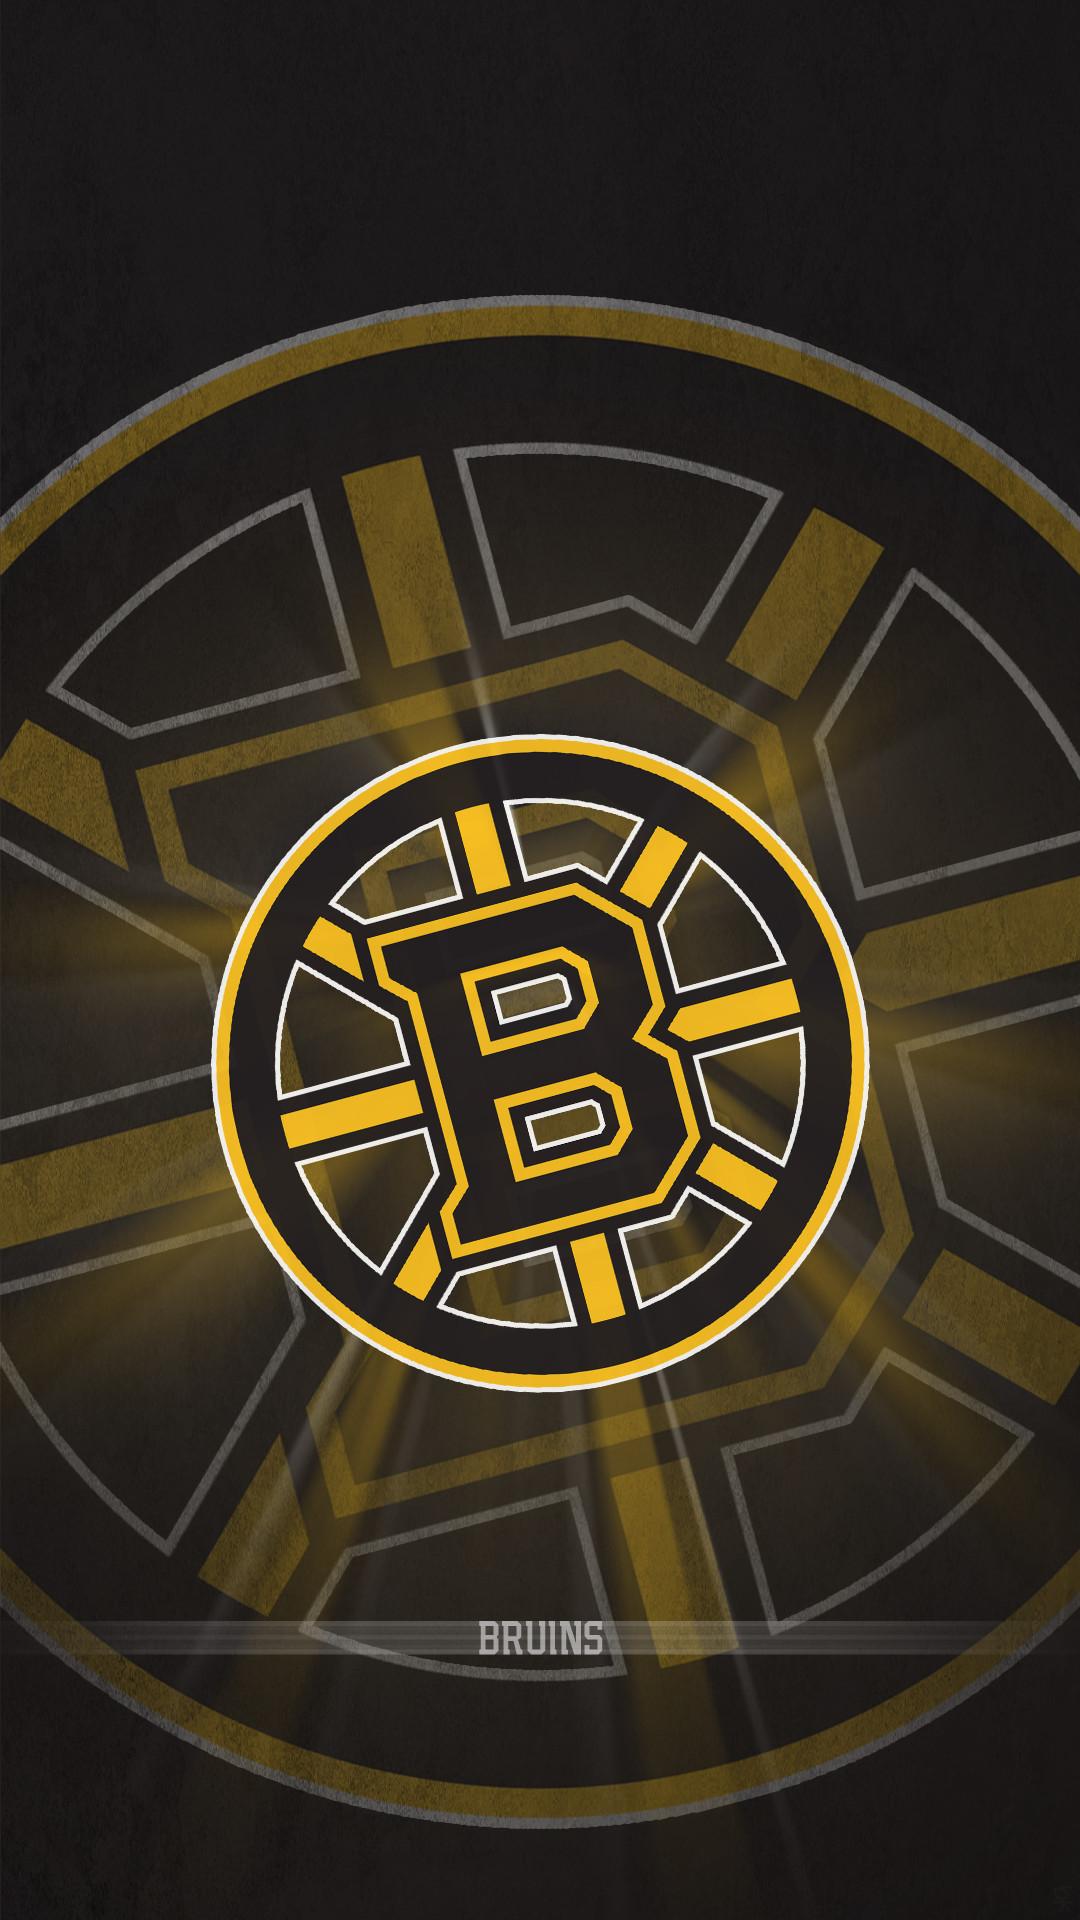 Bruins 1080.png